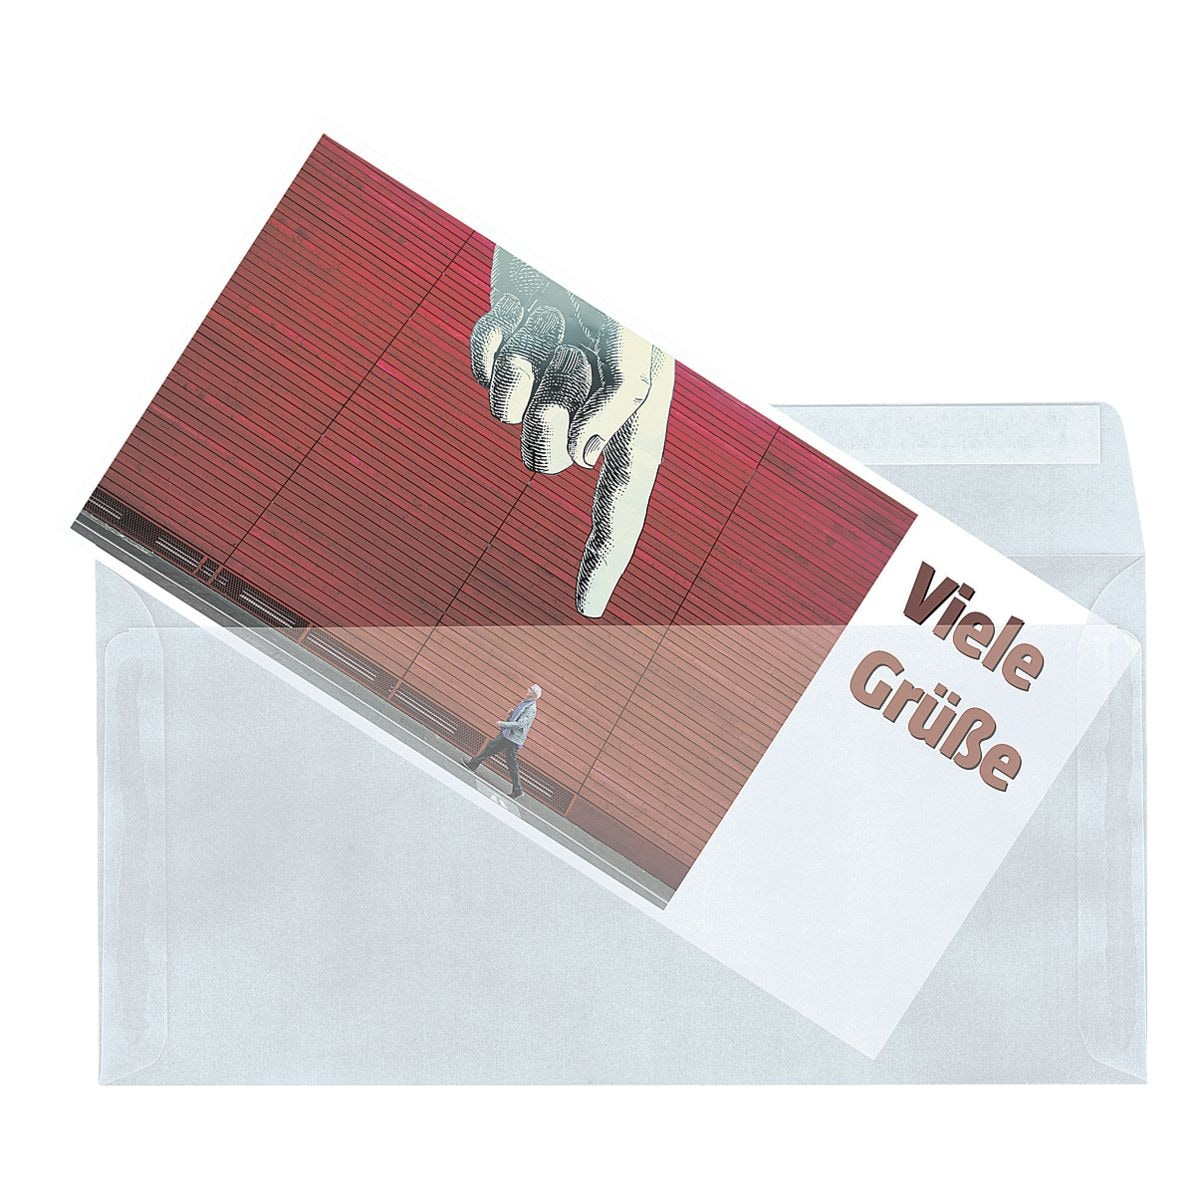 Mailmedia 100 Transparente Briefumschläge, DIN lang+ 82 g/m² ohne Fenster